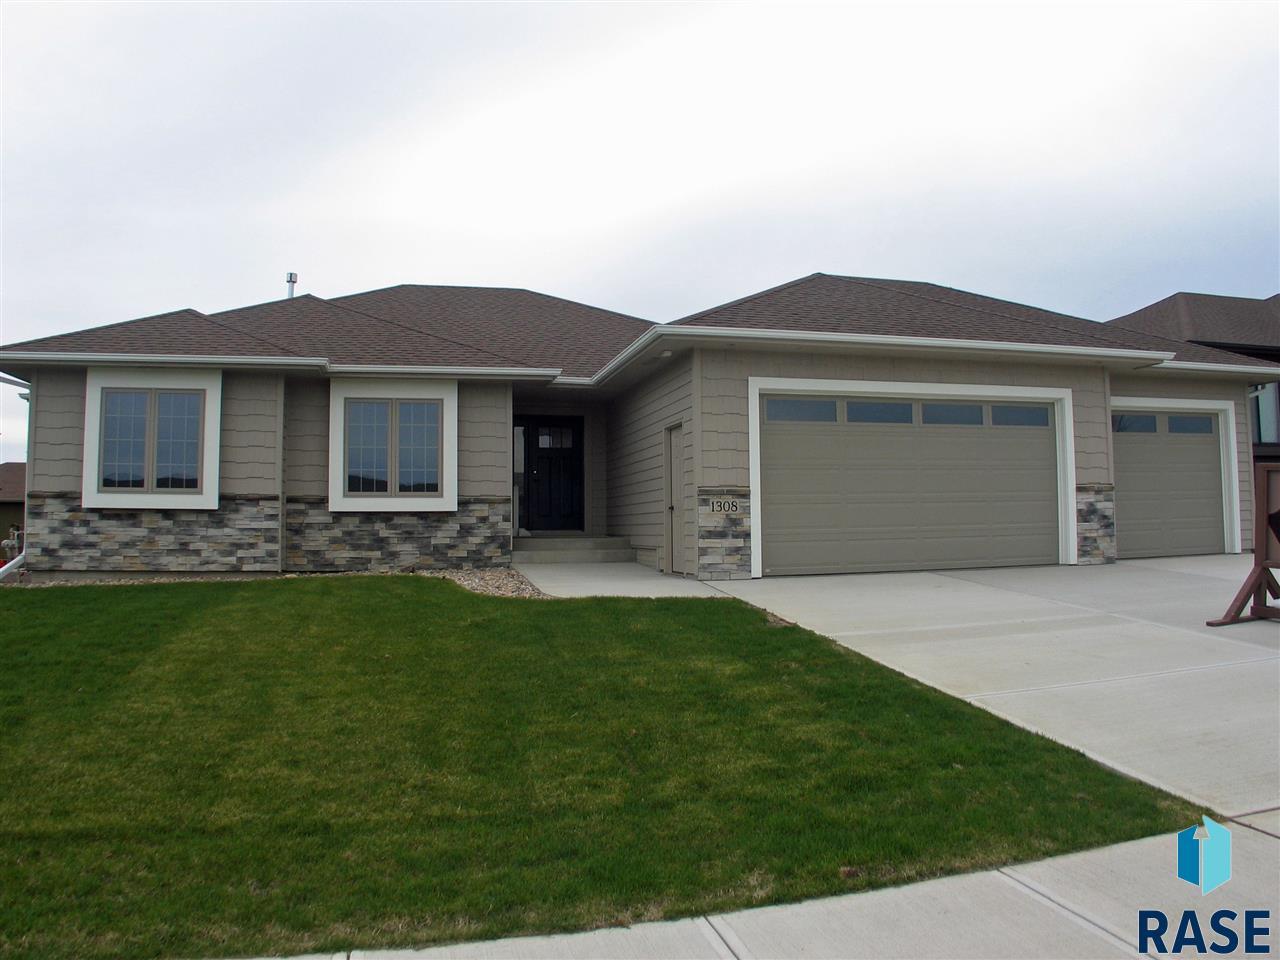 1308 South Wheatland Ave, Sioux Falls, SD 57106